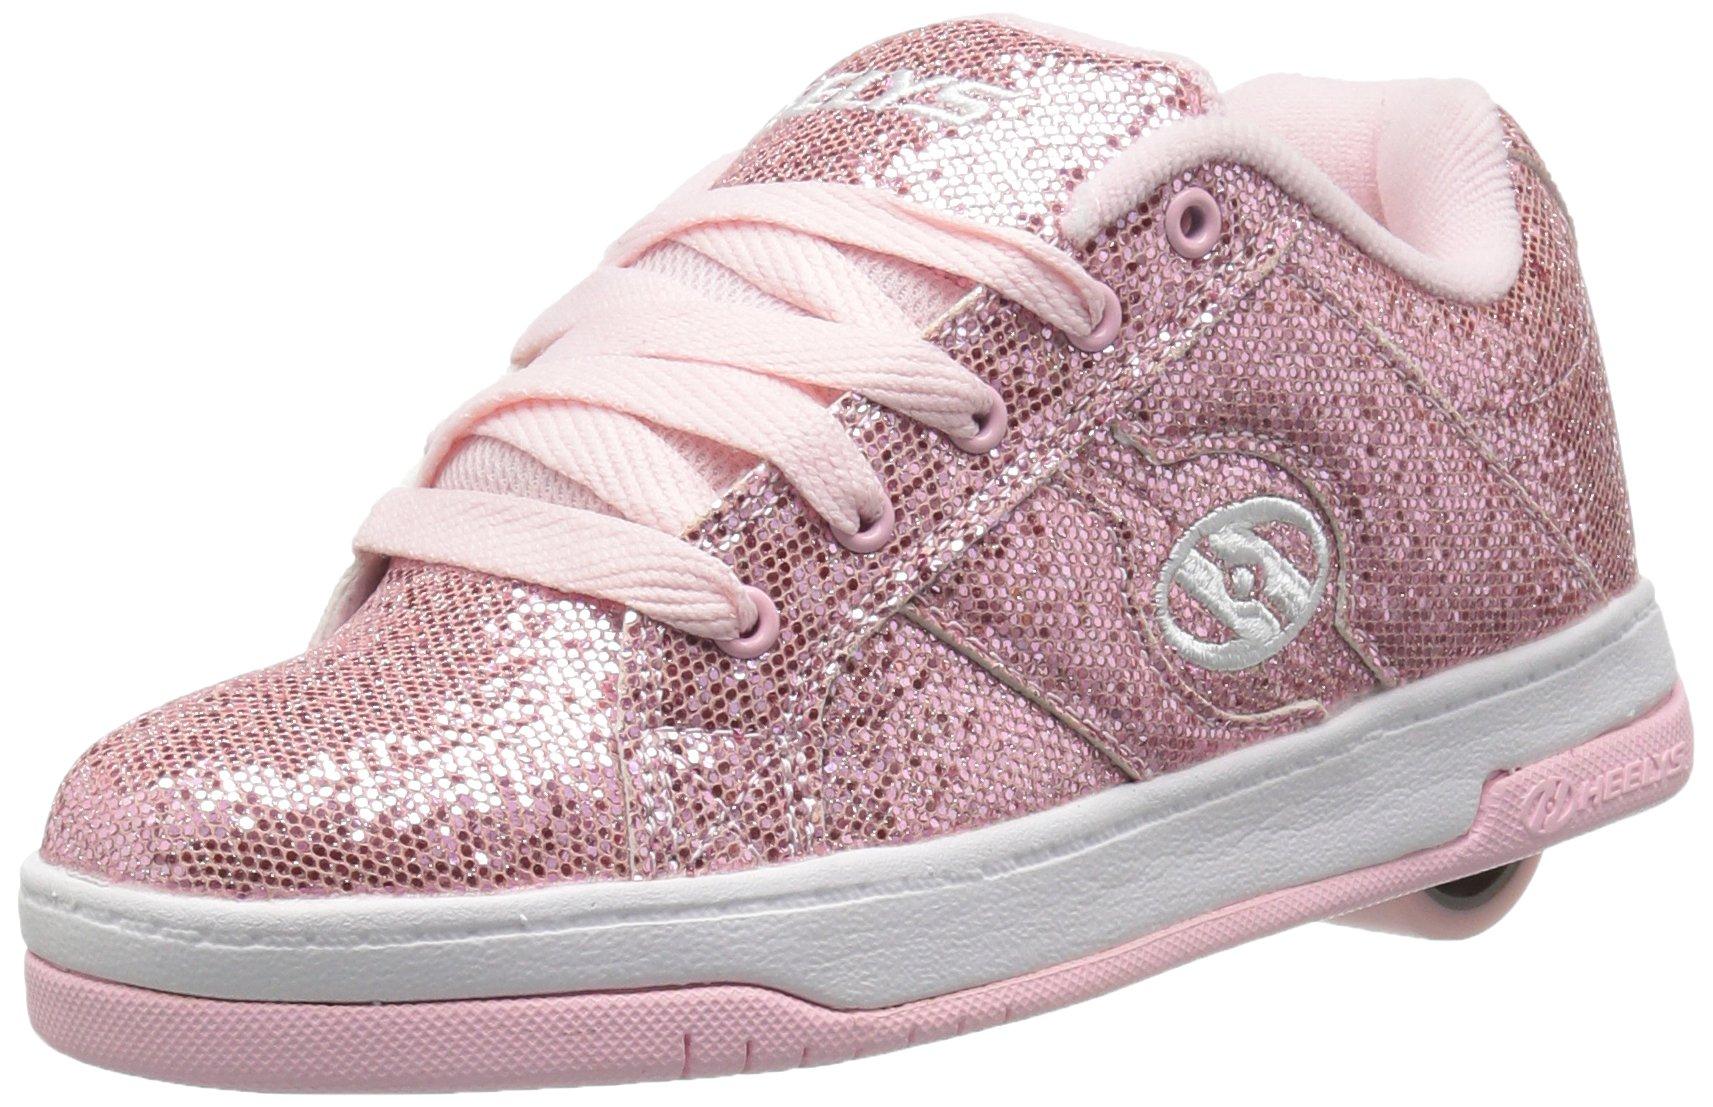 Heelys Split Sneaker Light Pink Disco Glitter 8 M US Big Kid